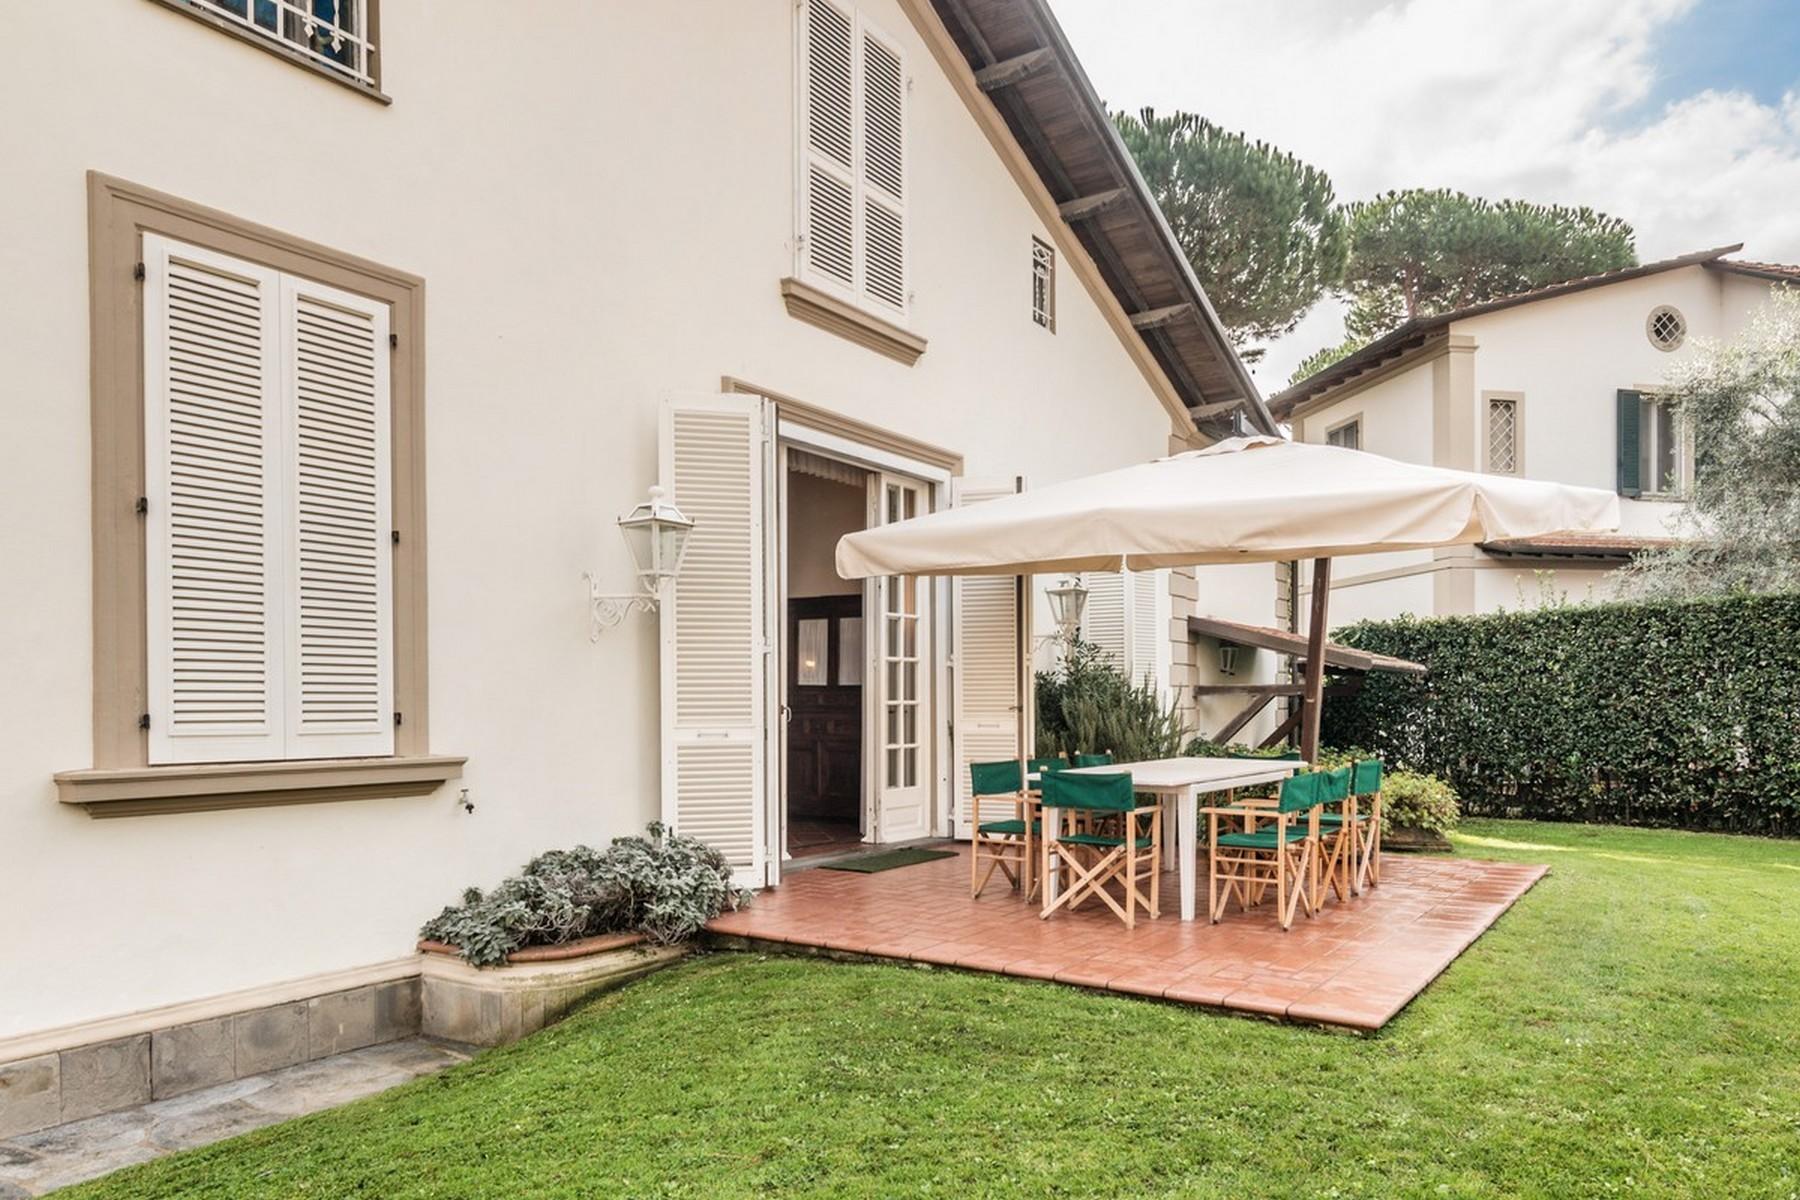 Additional photo for property listing at Incomparable property in Forte dei Marmi Roma Imperiale Forte Dei Marmi, Lucca 50100 Italien